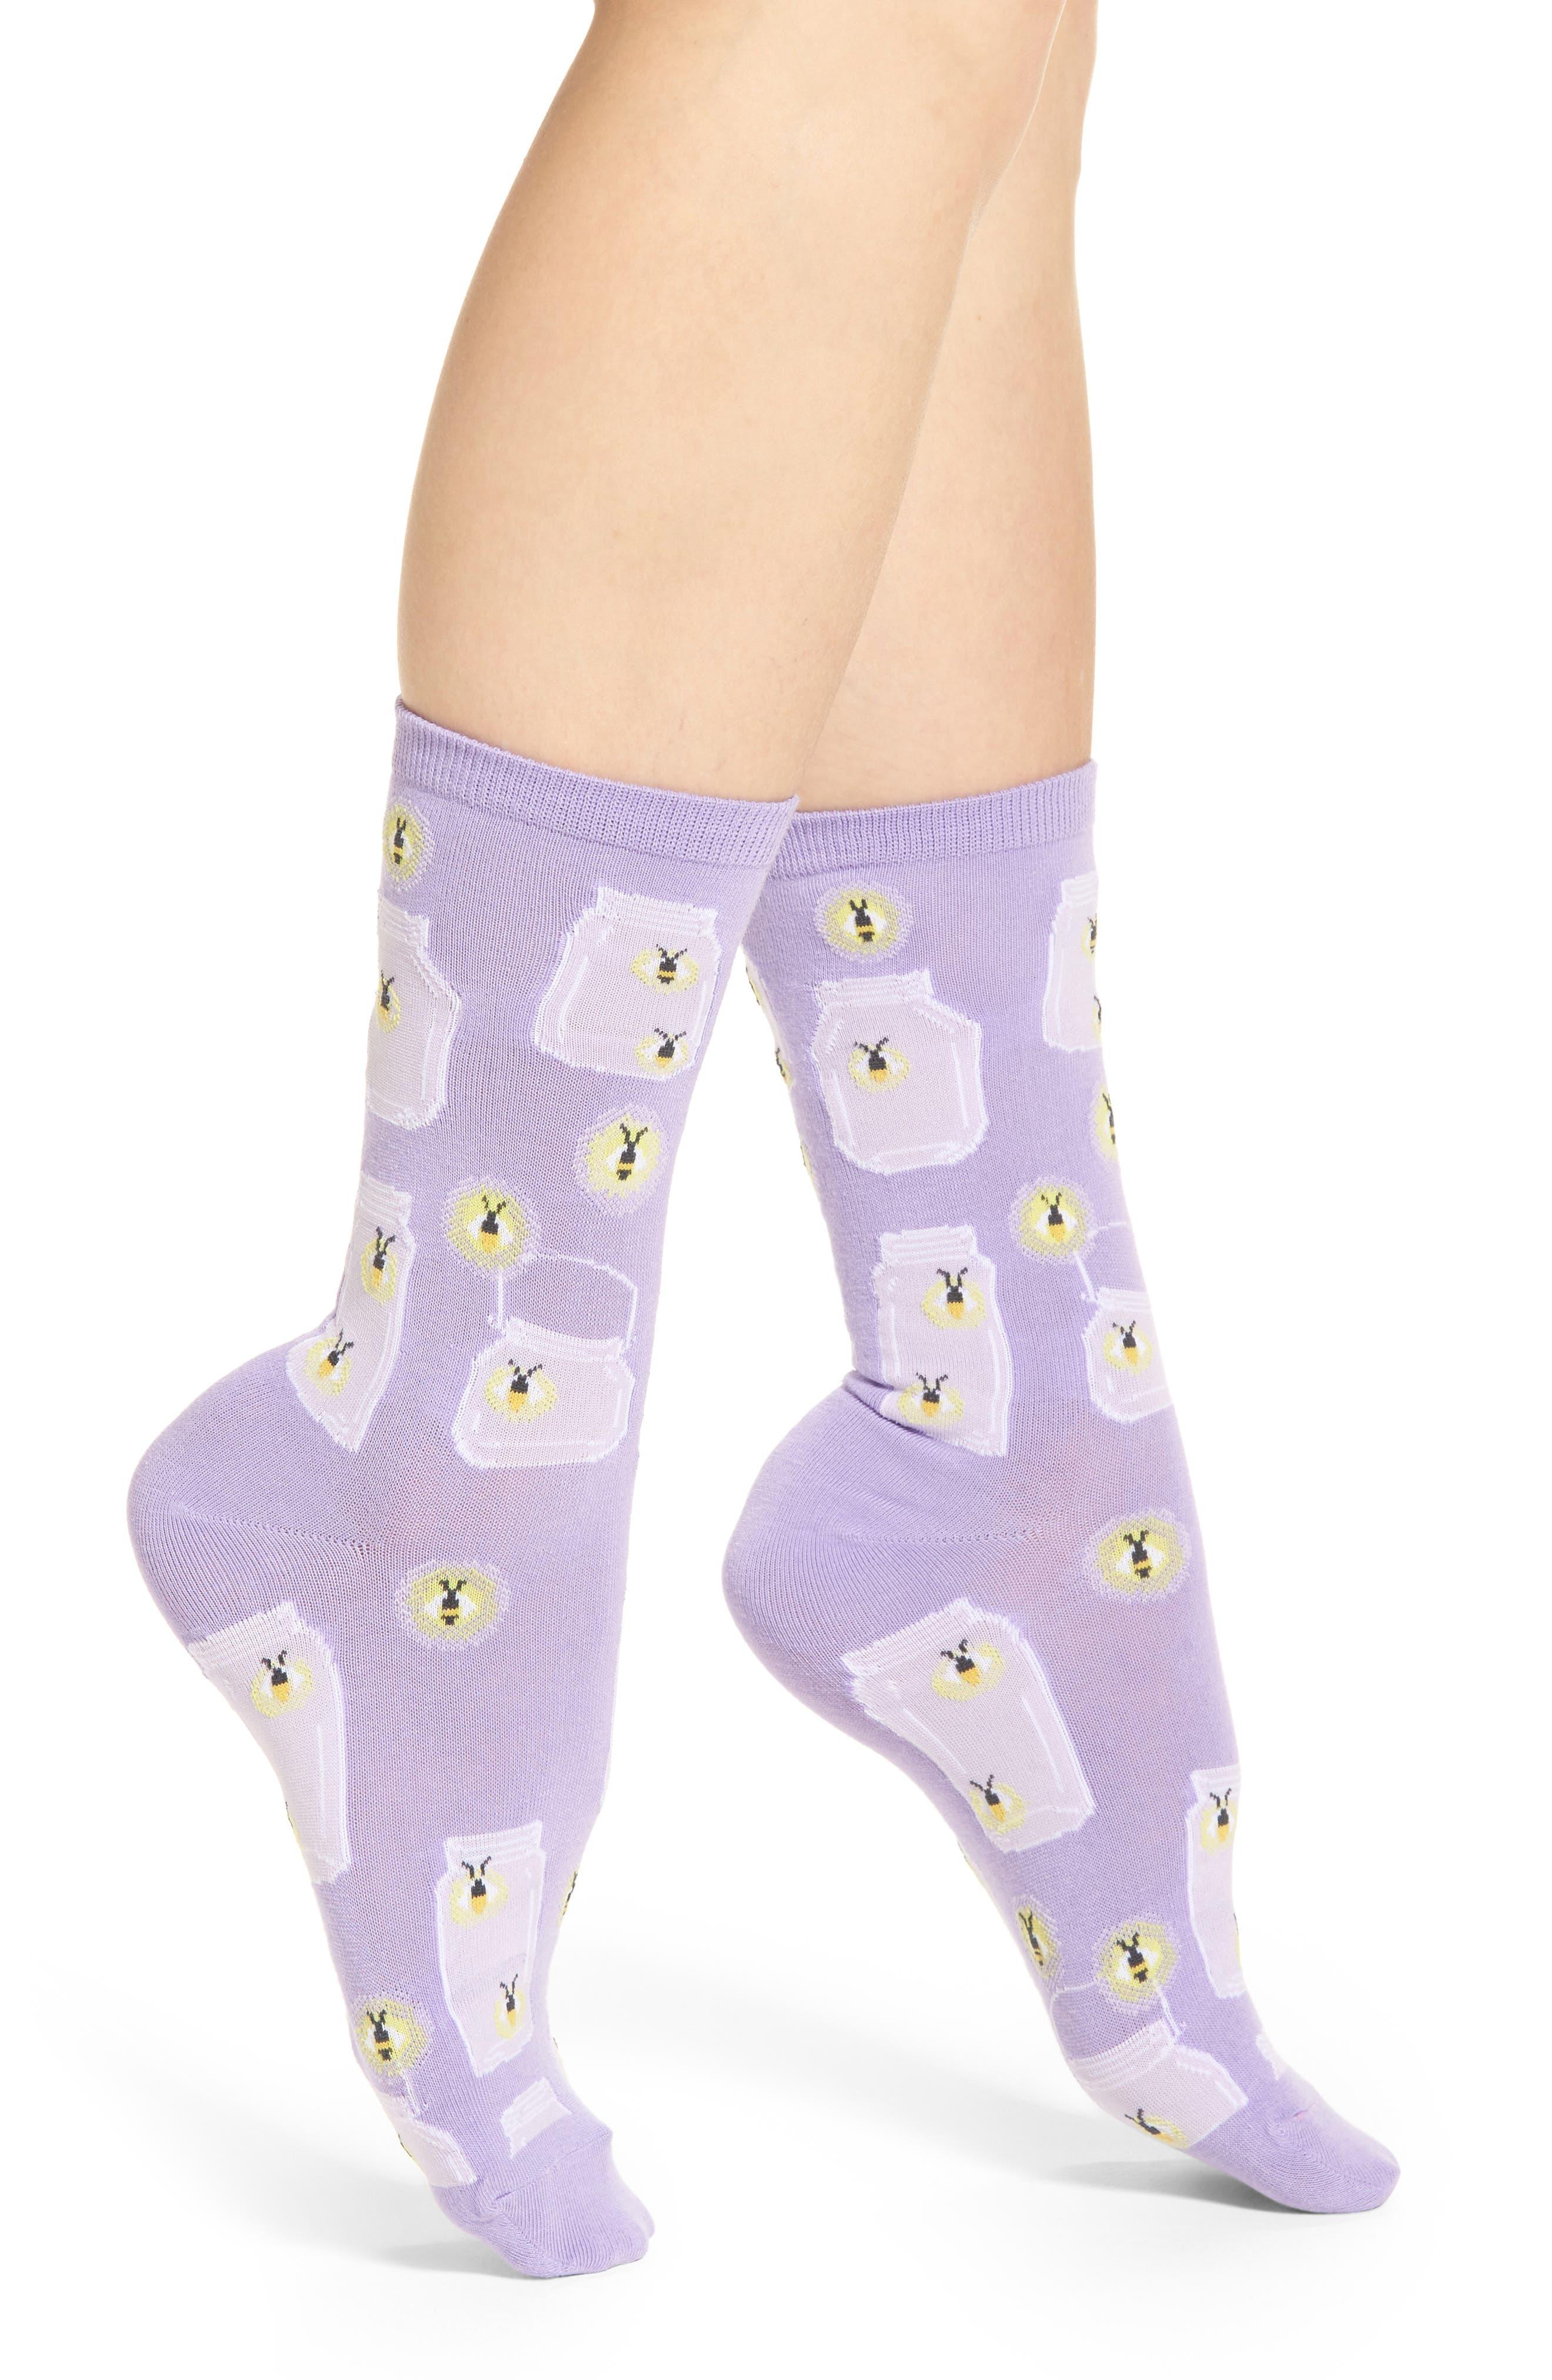 Hot Sox Fireflies Crew Socks (3 for $15)